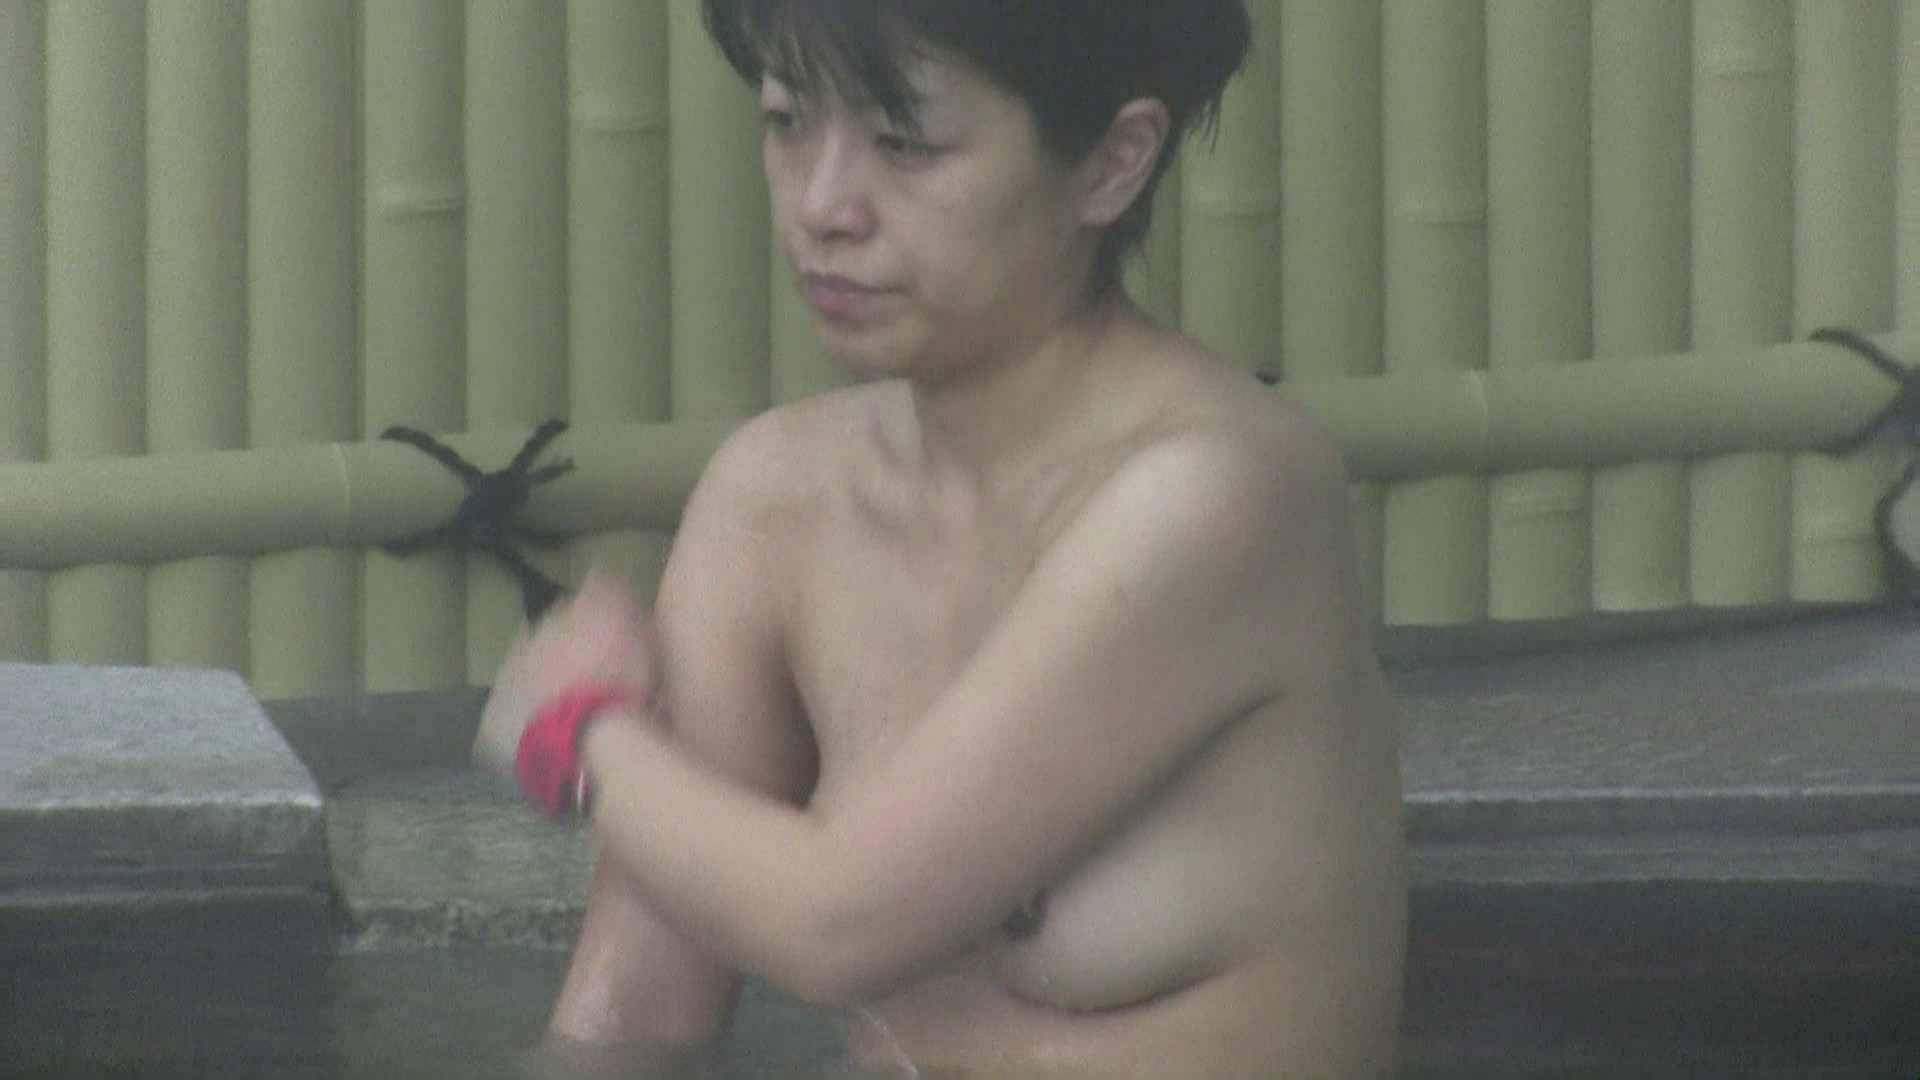 Aquaな露天風呂Vol.585 盗撮   OLセックス  51画像 28